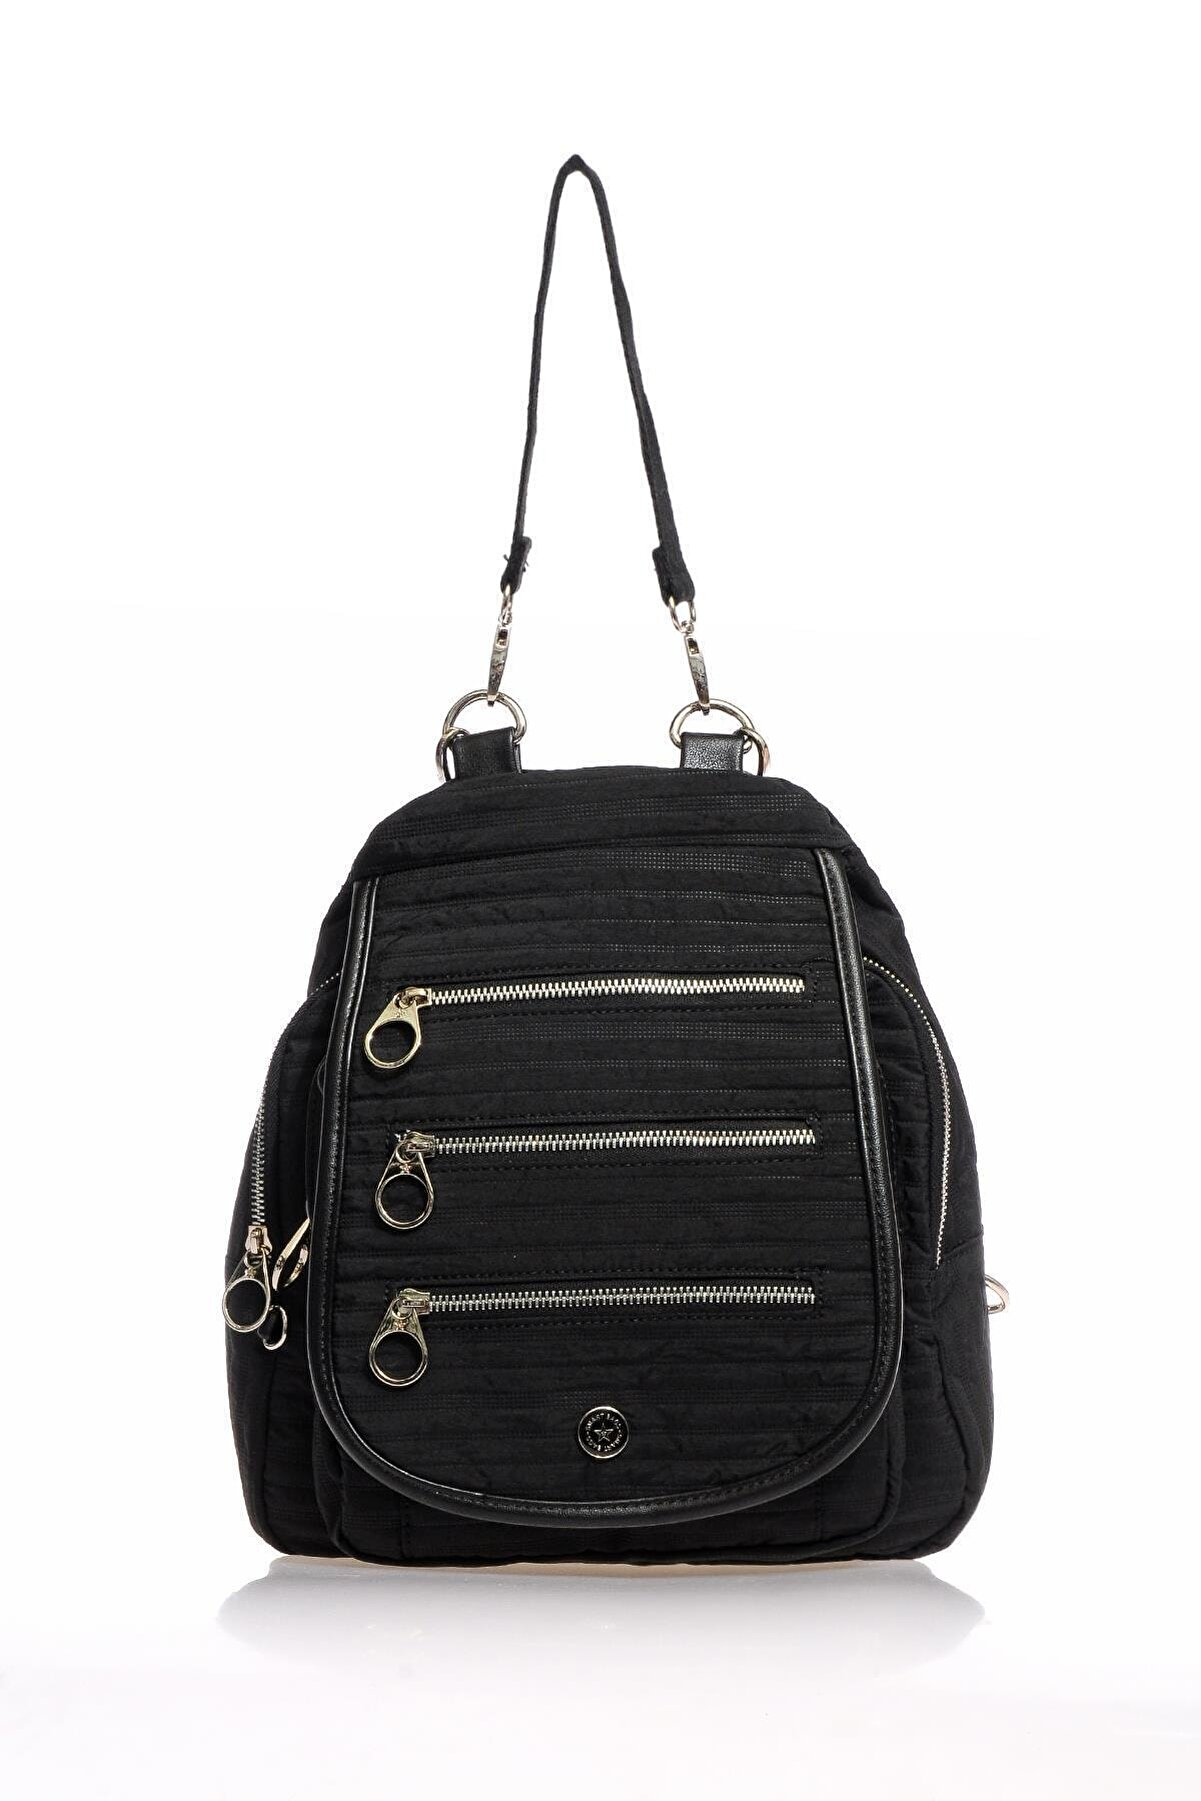 Smart Bags Smb3014-0001 Siyah Kadın Sırt Çantası